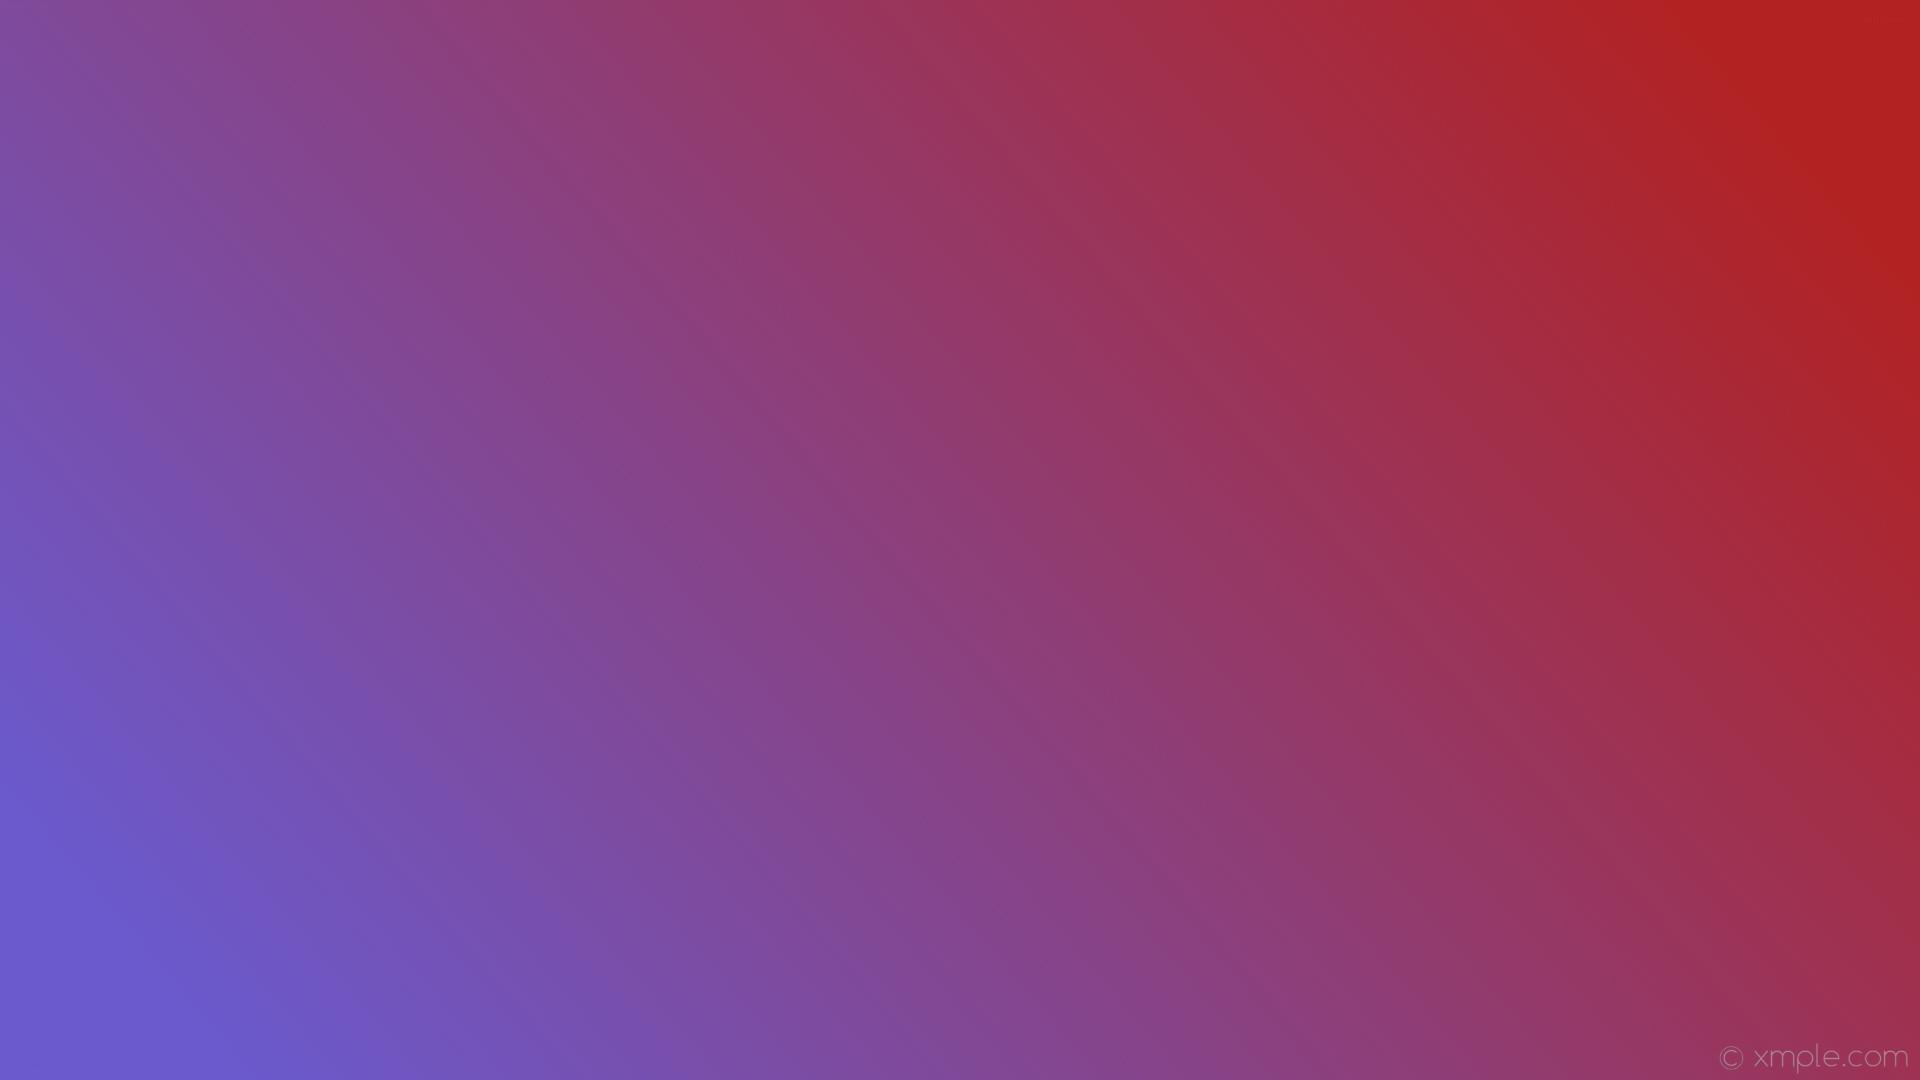 wallpaper red purple gradient linear fire brick slate blue #b22222 #6a5acd  15°